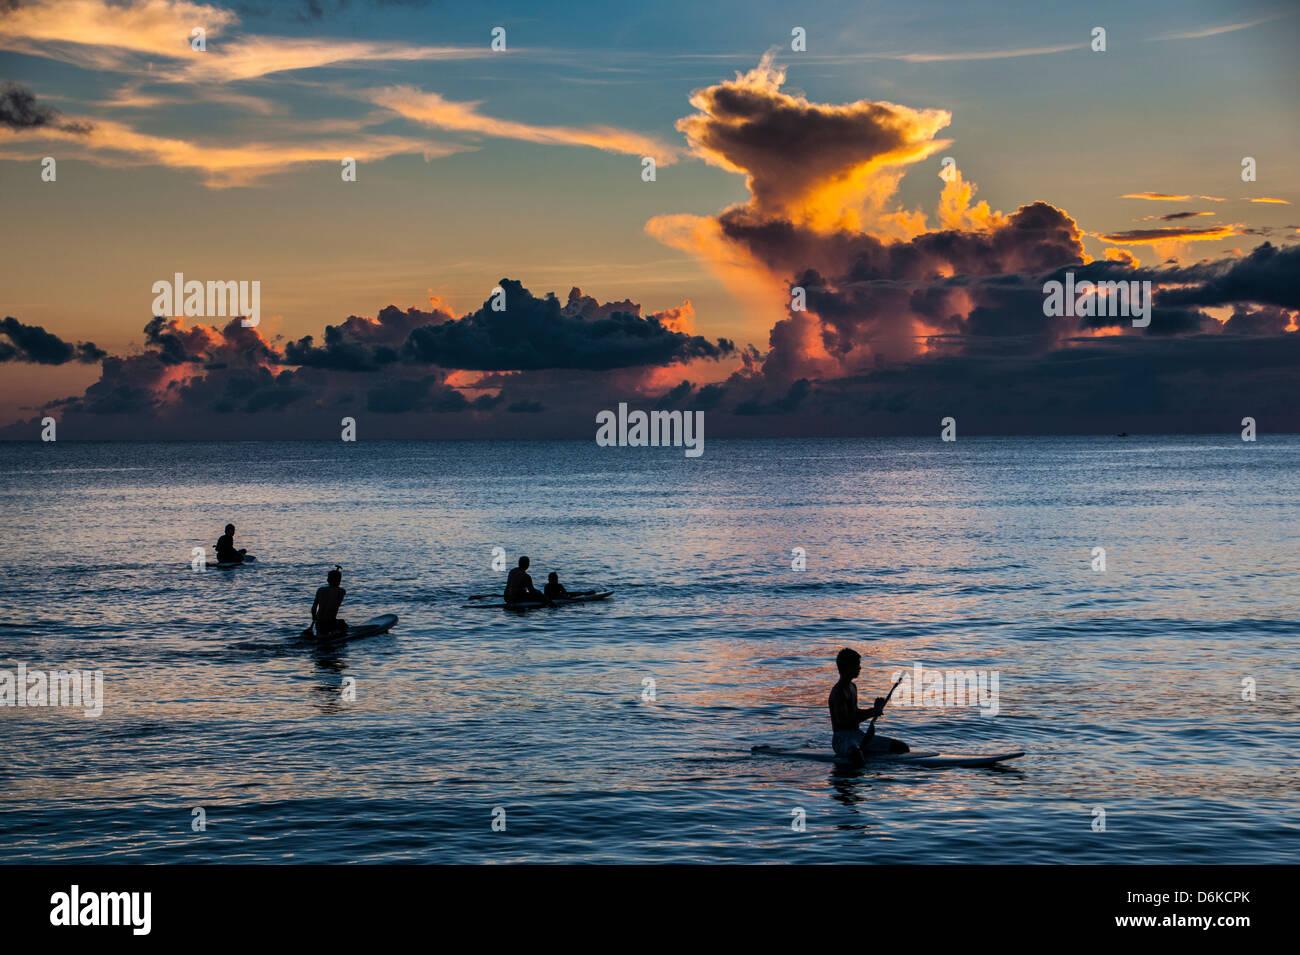 Surfer bei Sonnenuntergang in Guam, US-Territorium, Central Pacific, Pazifik Stockbild